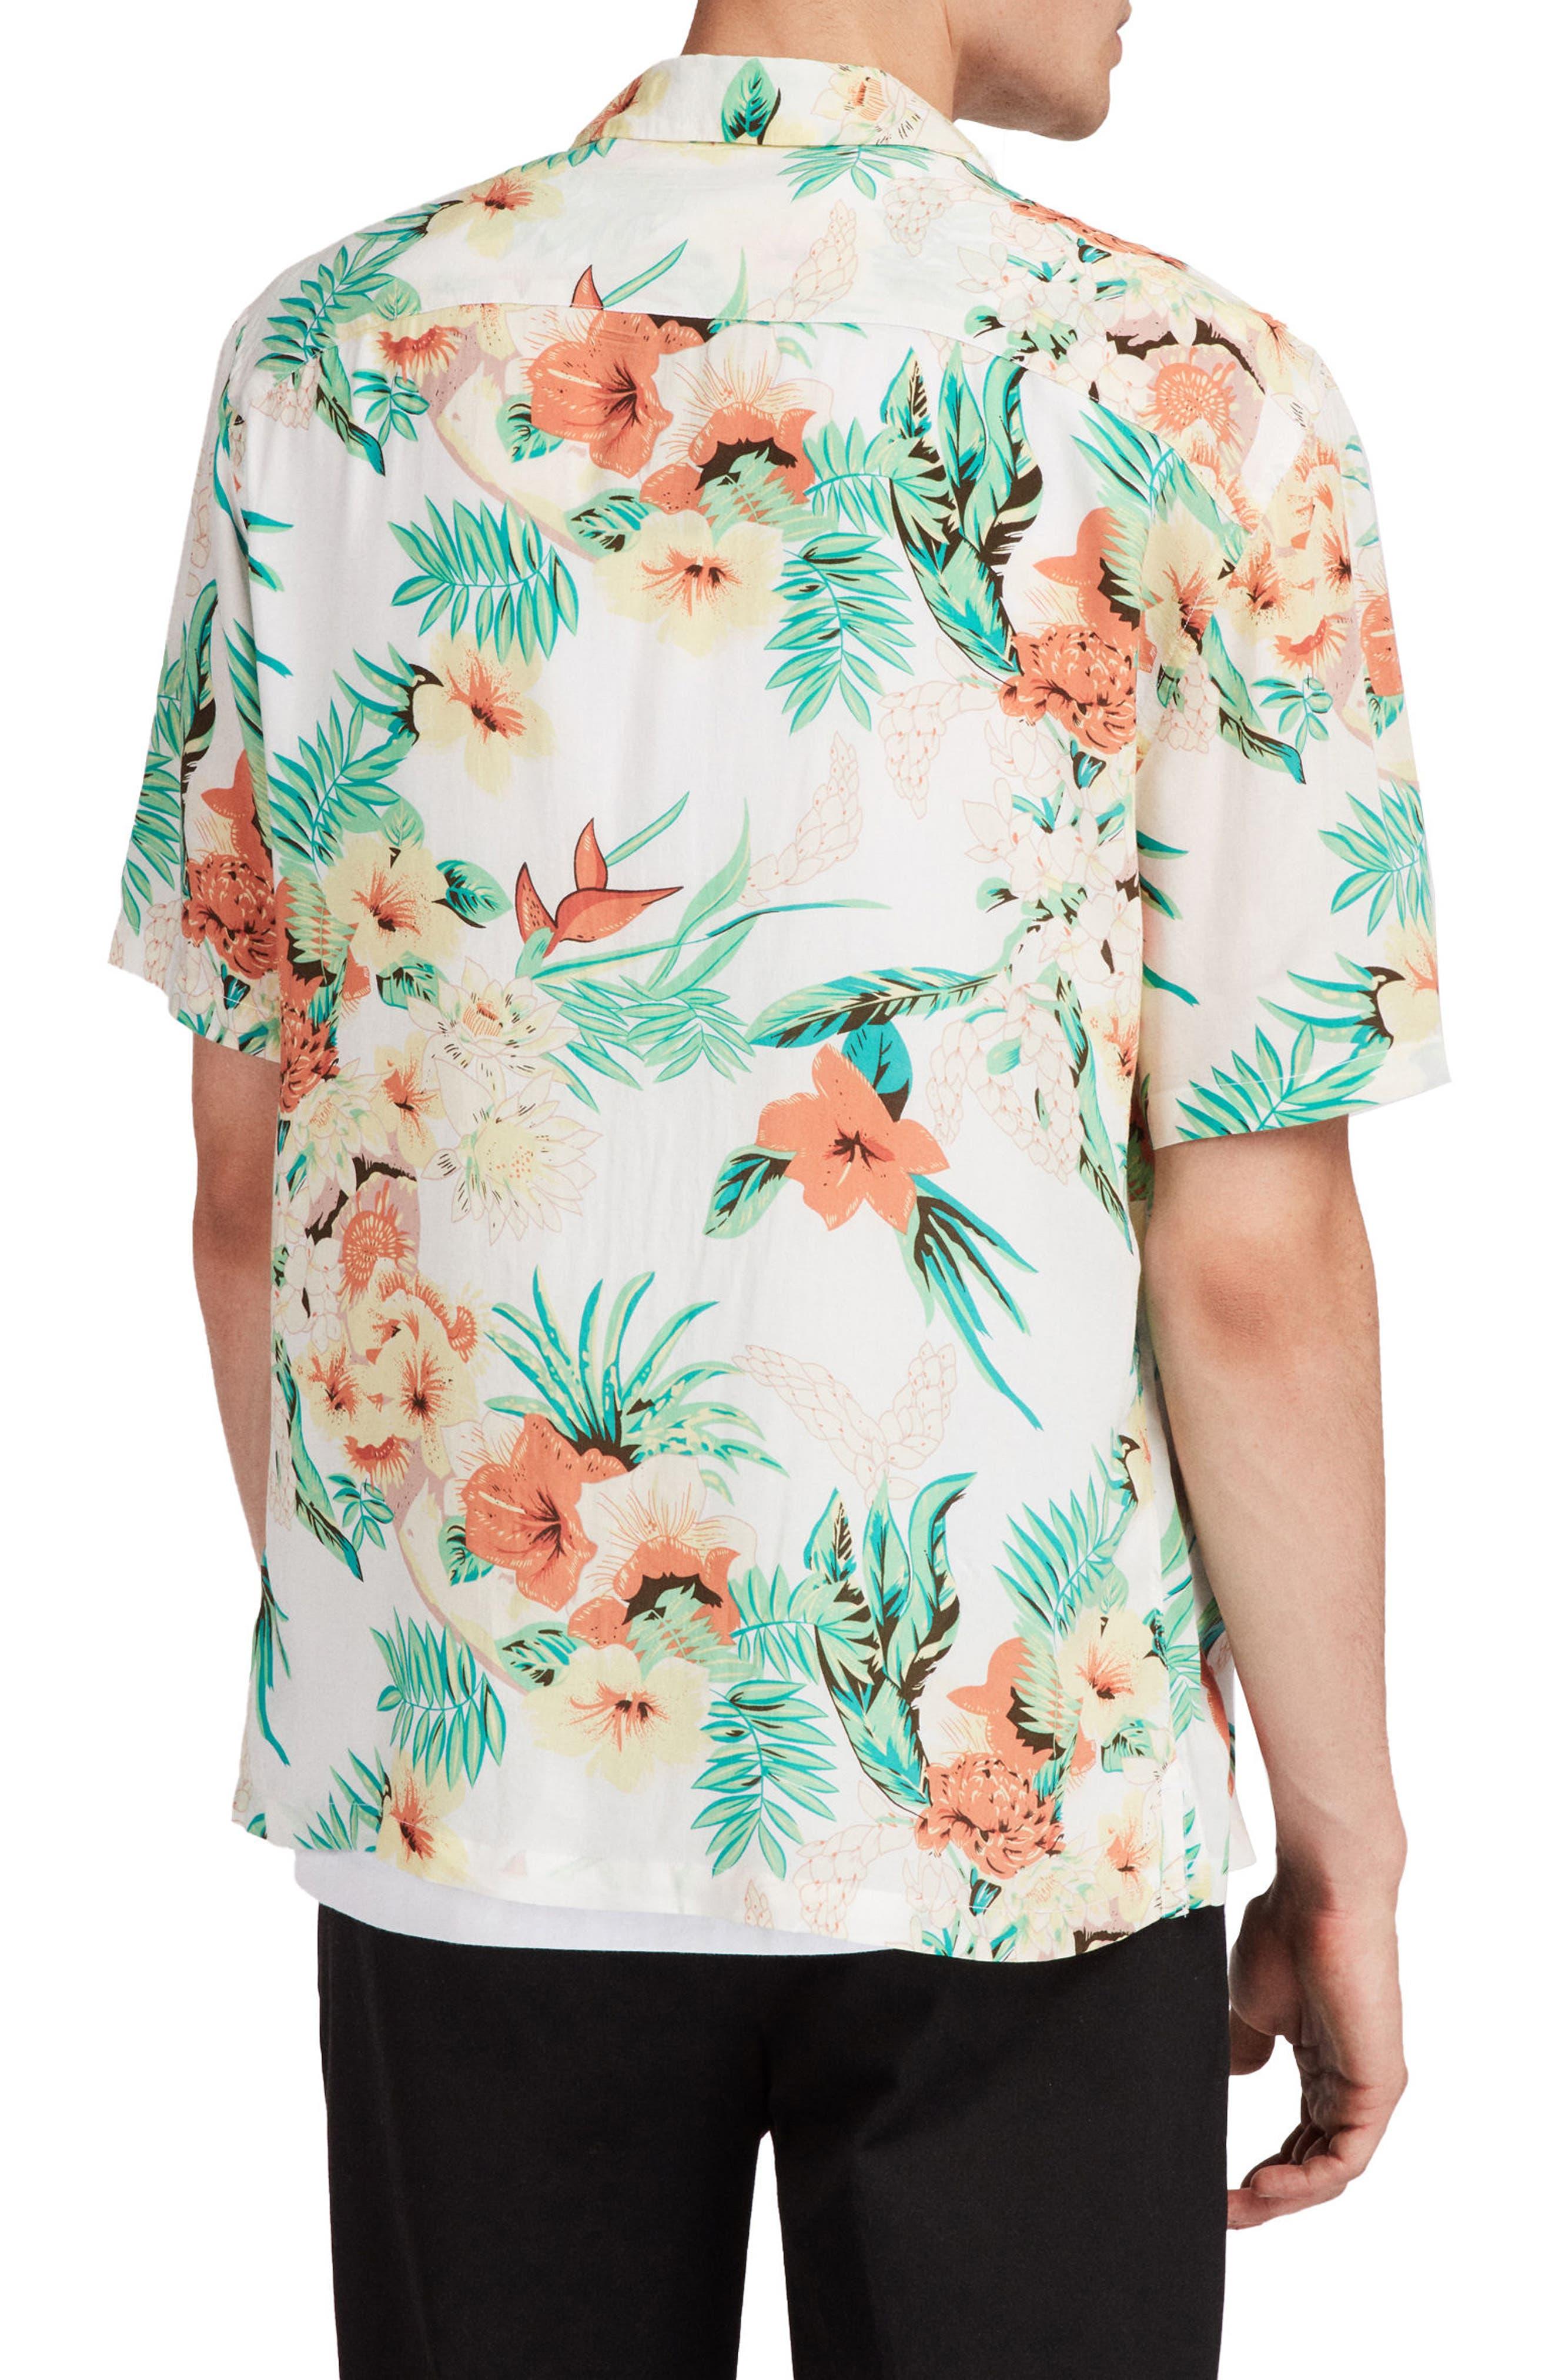 Calypso Regular Fit Sport Shirt,                             Alternate thumbnail 3, color,                             Ecru